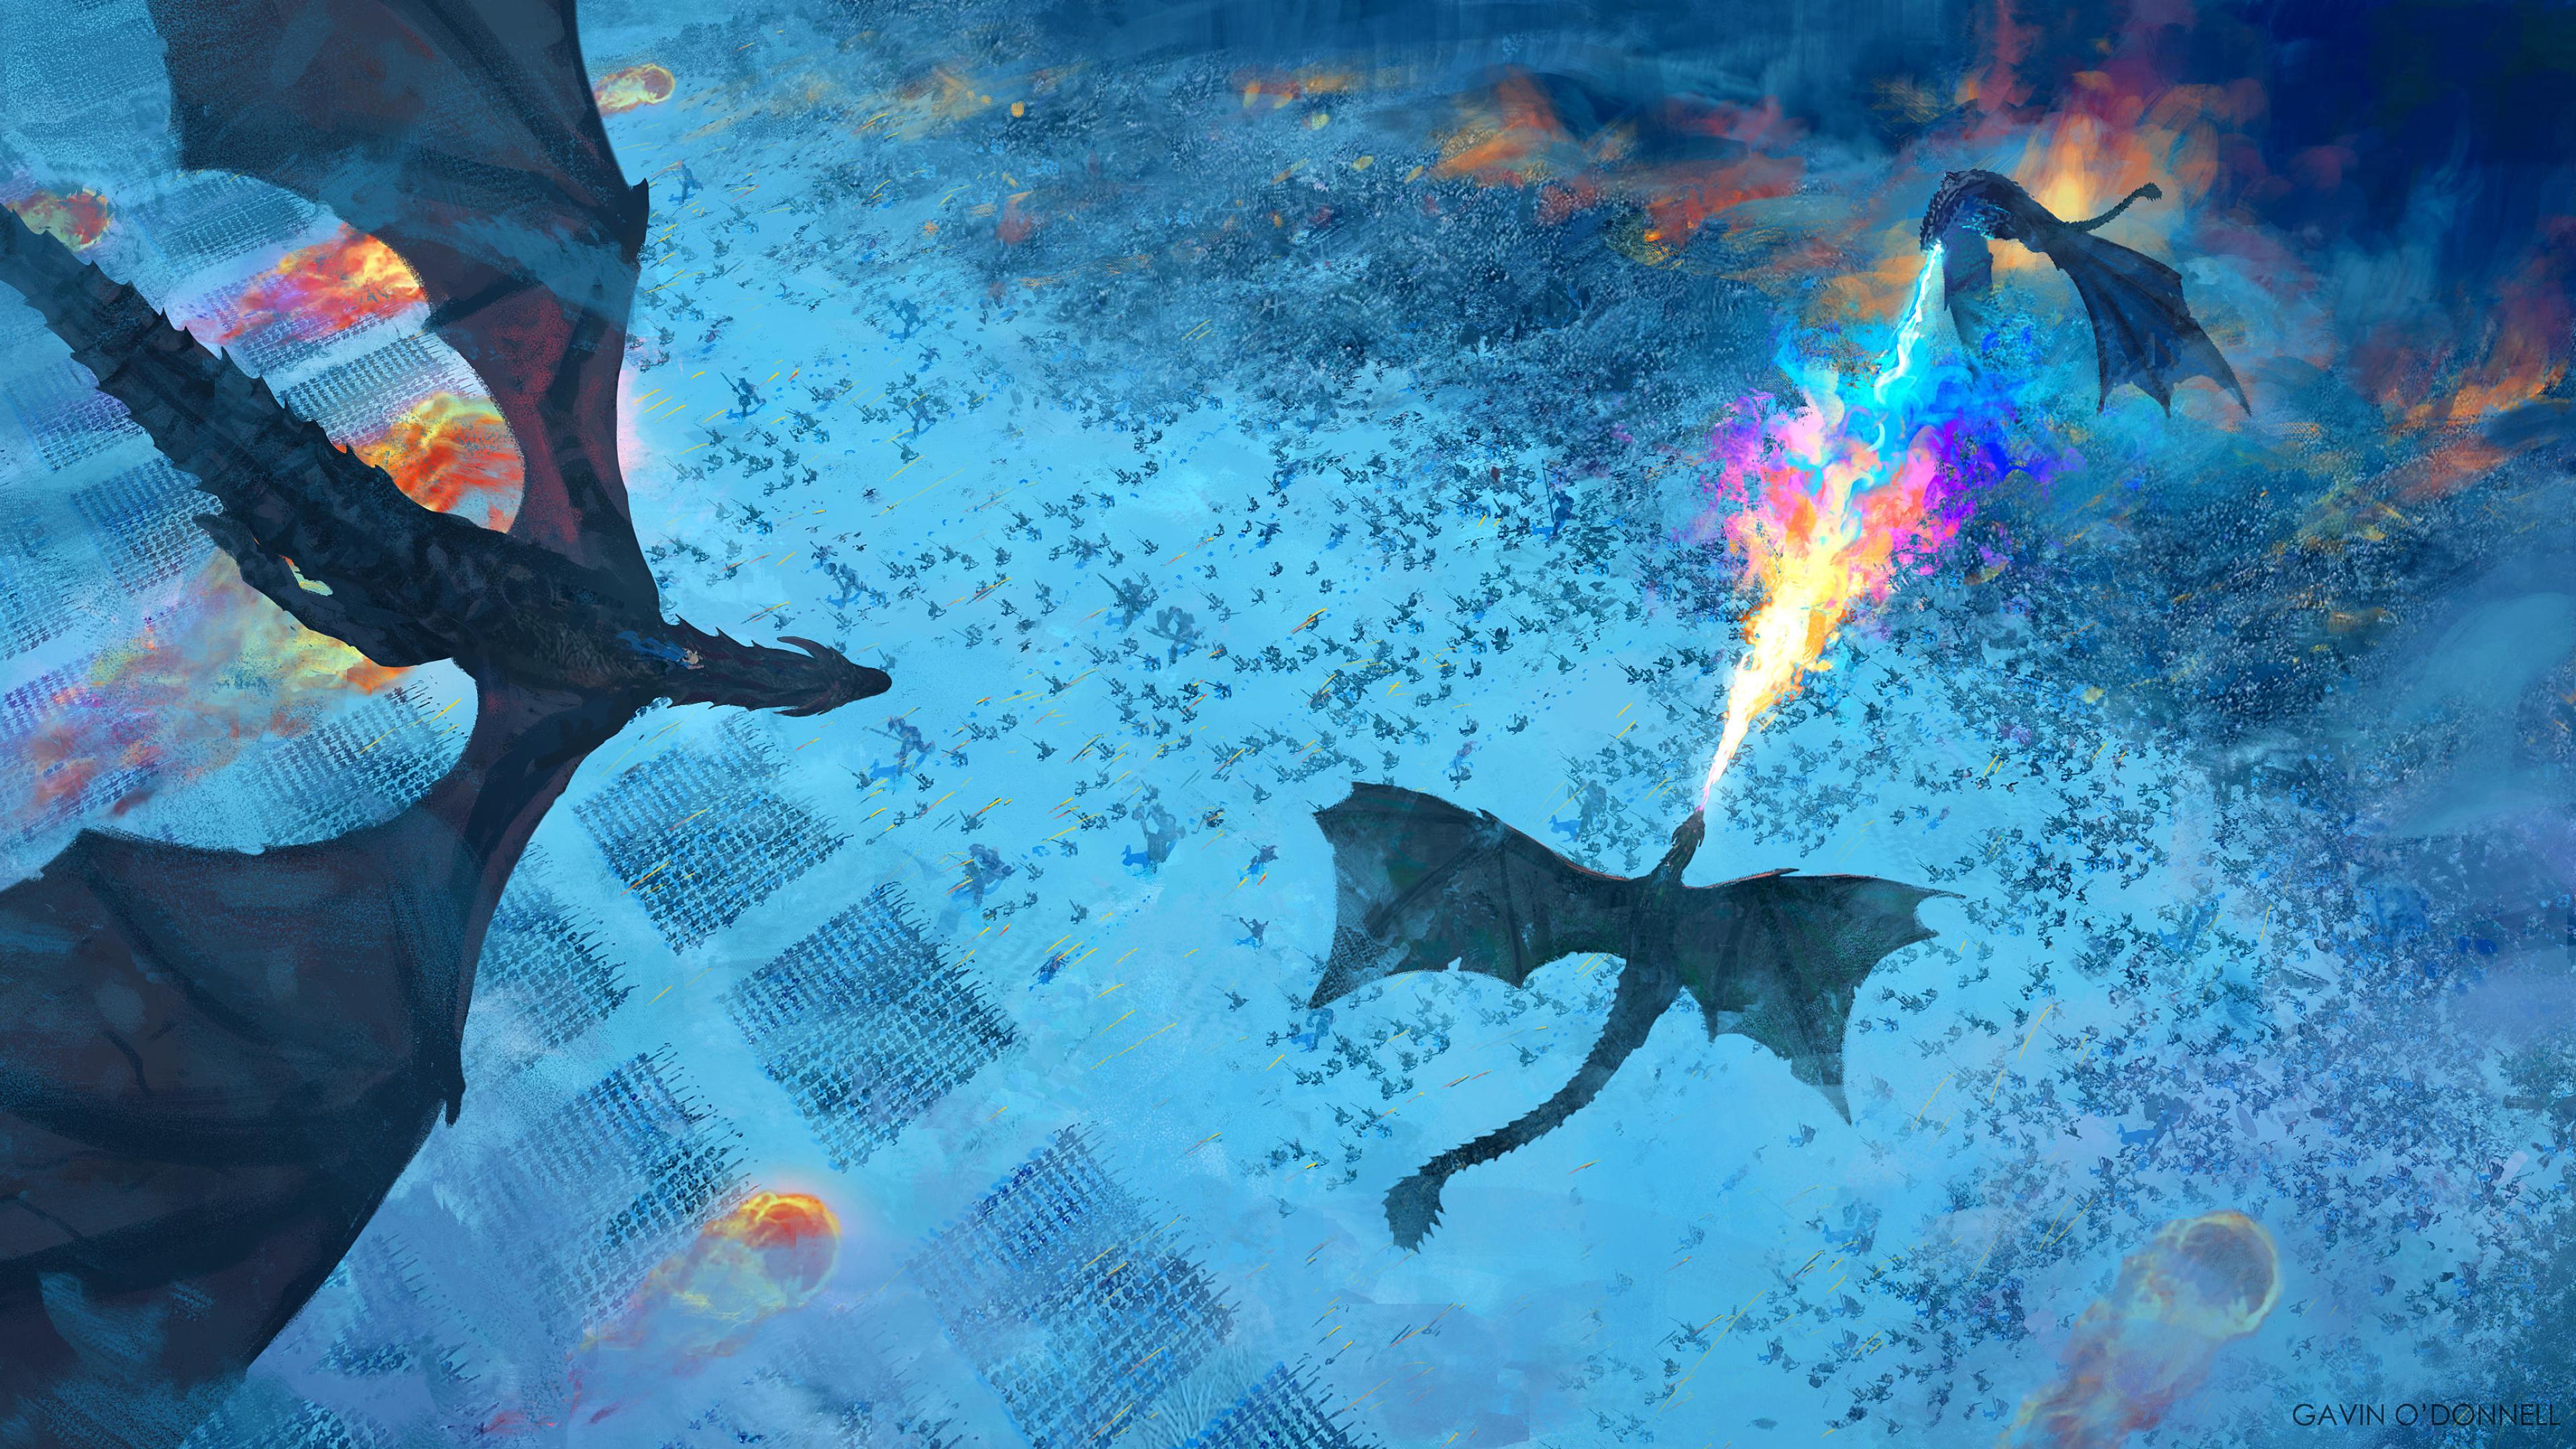 Dragons Game Of Thrones 8 Art 4K